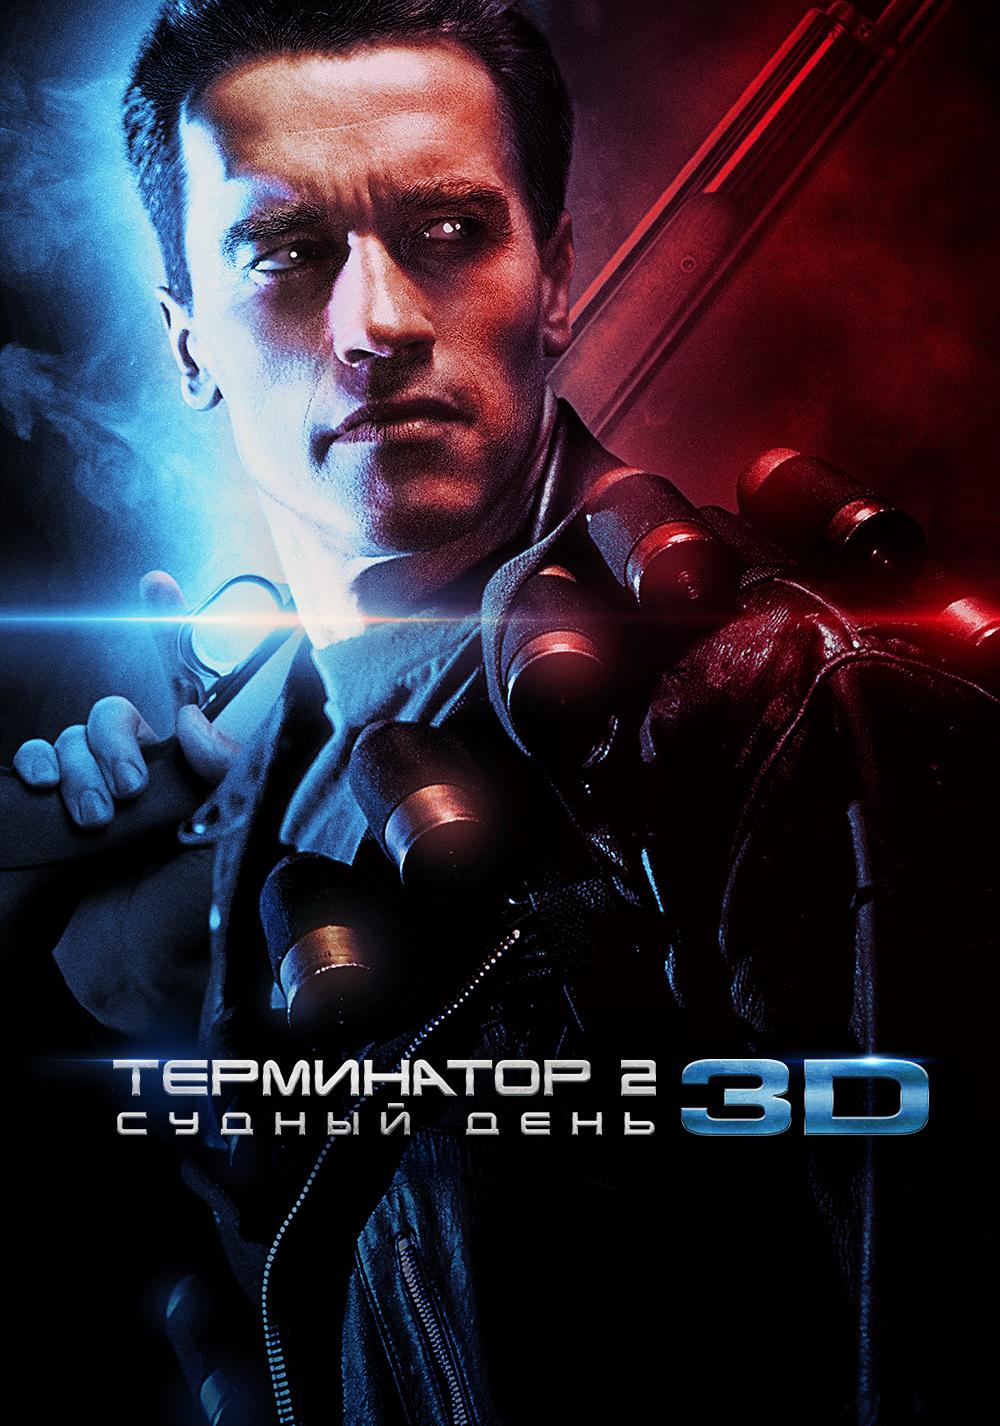 Terminator 2: Judgment Day   Movie fanart   fanart.tv